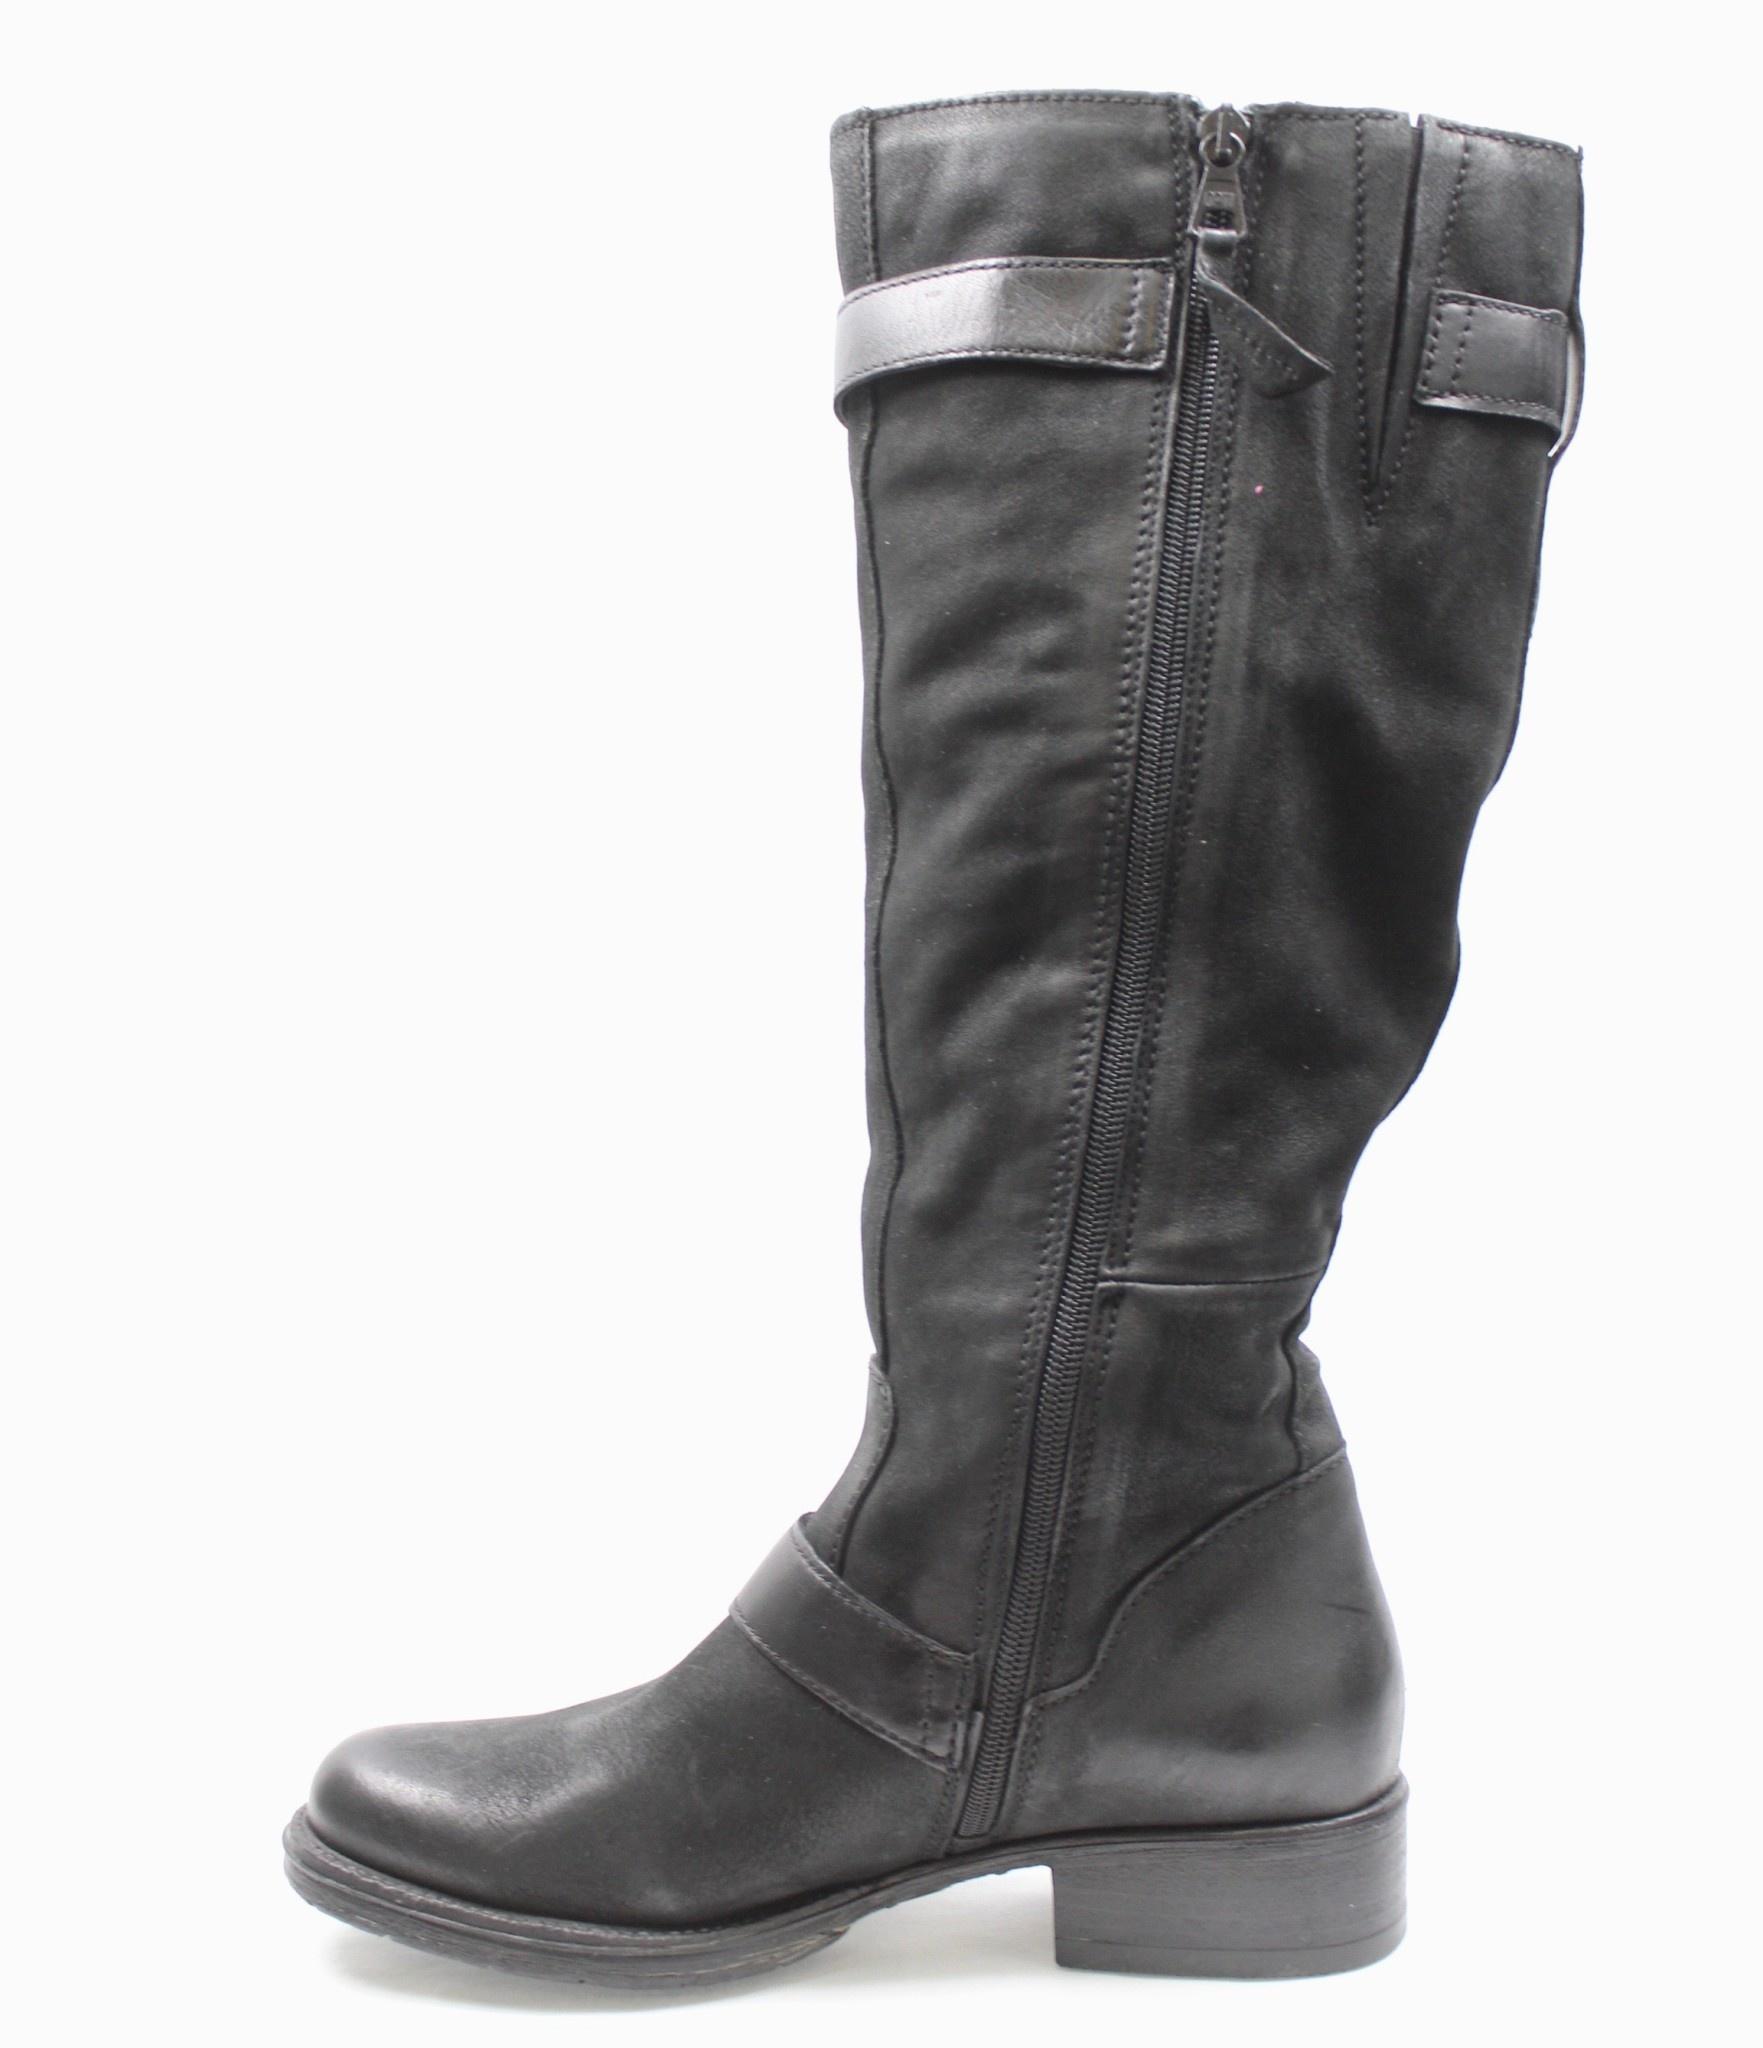 MJUS MJUS 185306 Tall Wide Calf Boot  Reg. $319  Sale $239